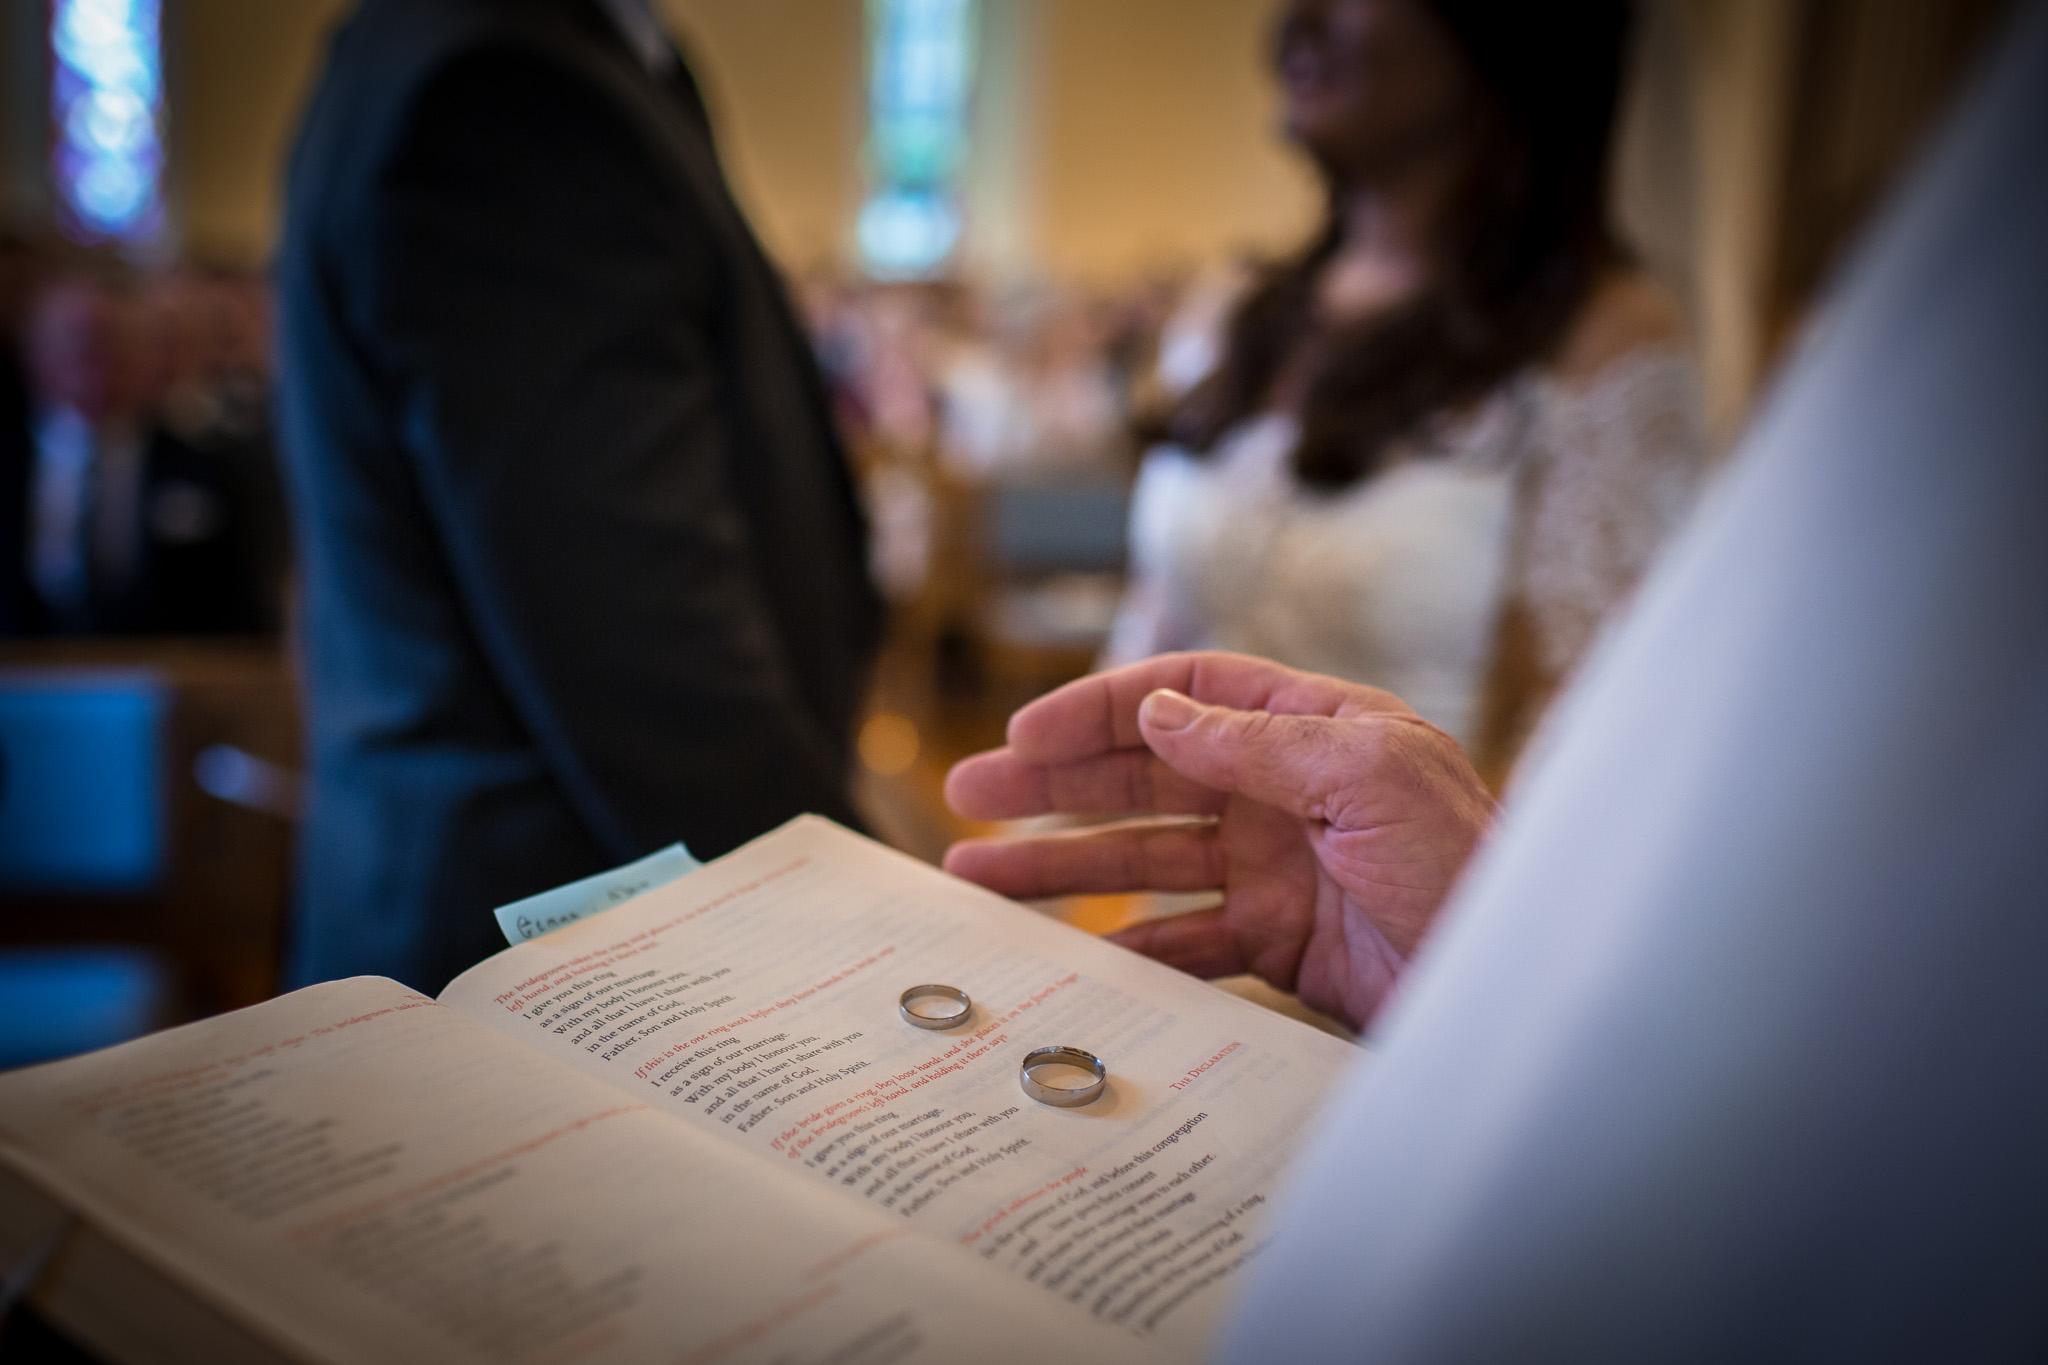 Mark_Barnes_Northern_Ireland_wedding_photographer_Harveys_Point_Donegall_Wedding_photography-Adam&Gemma-23.jpg